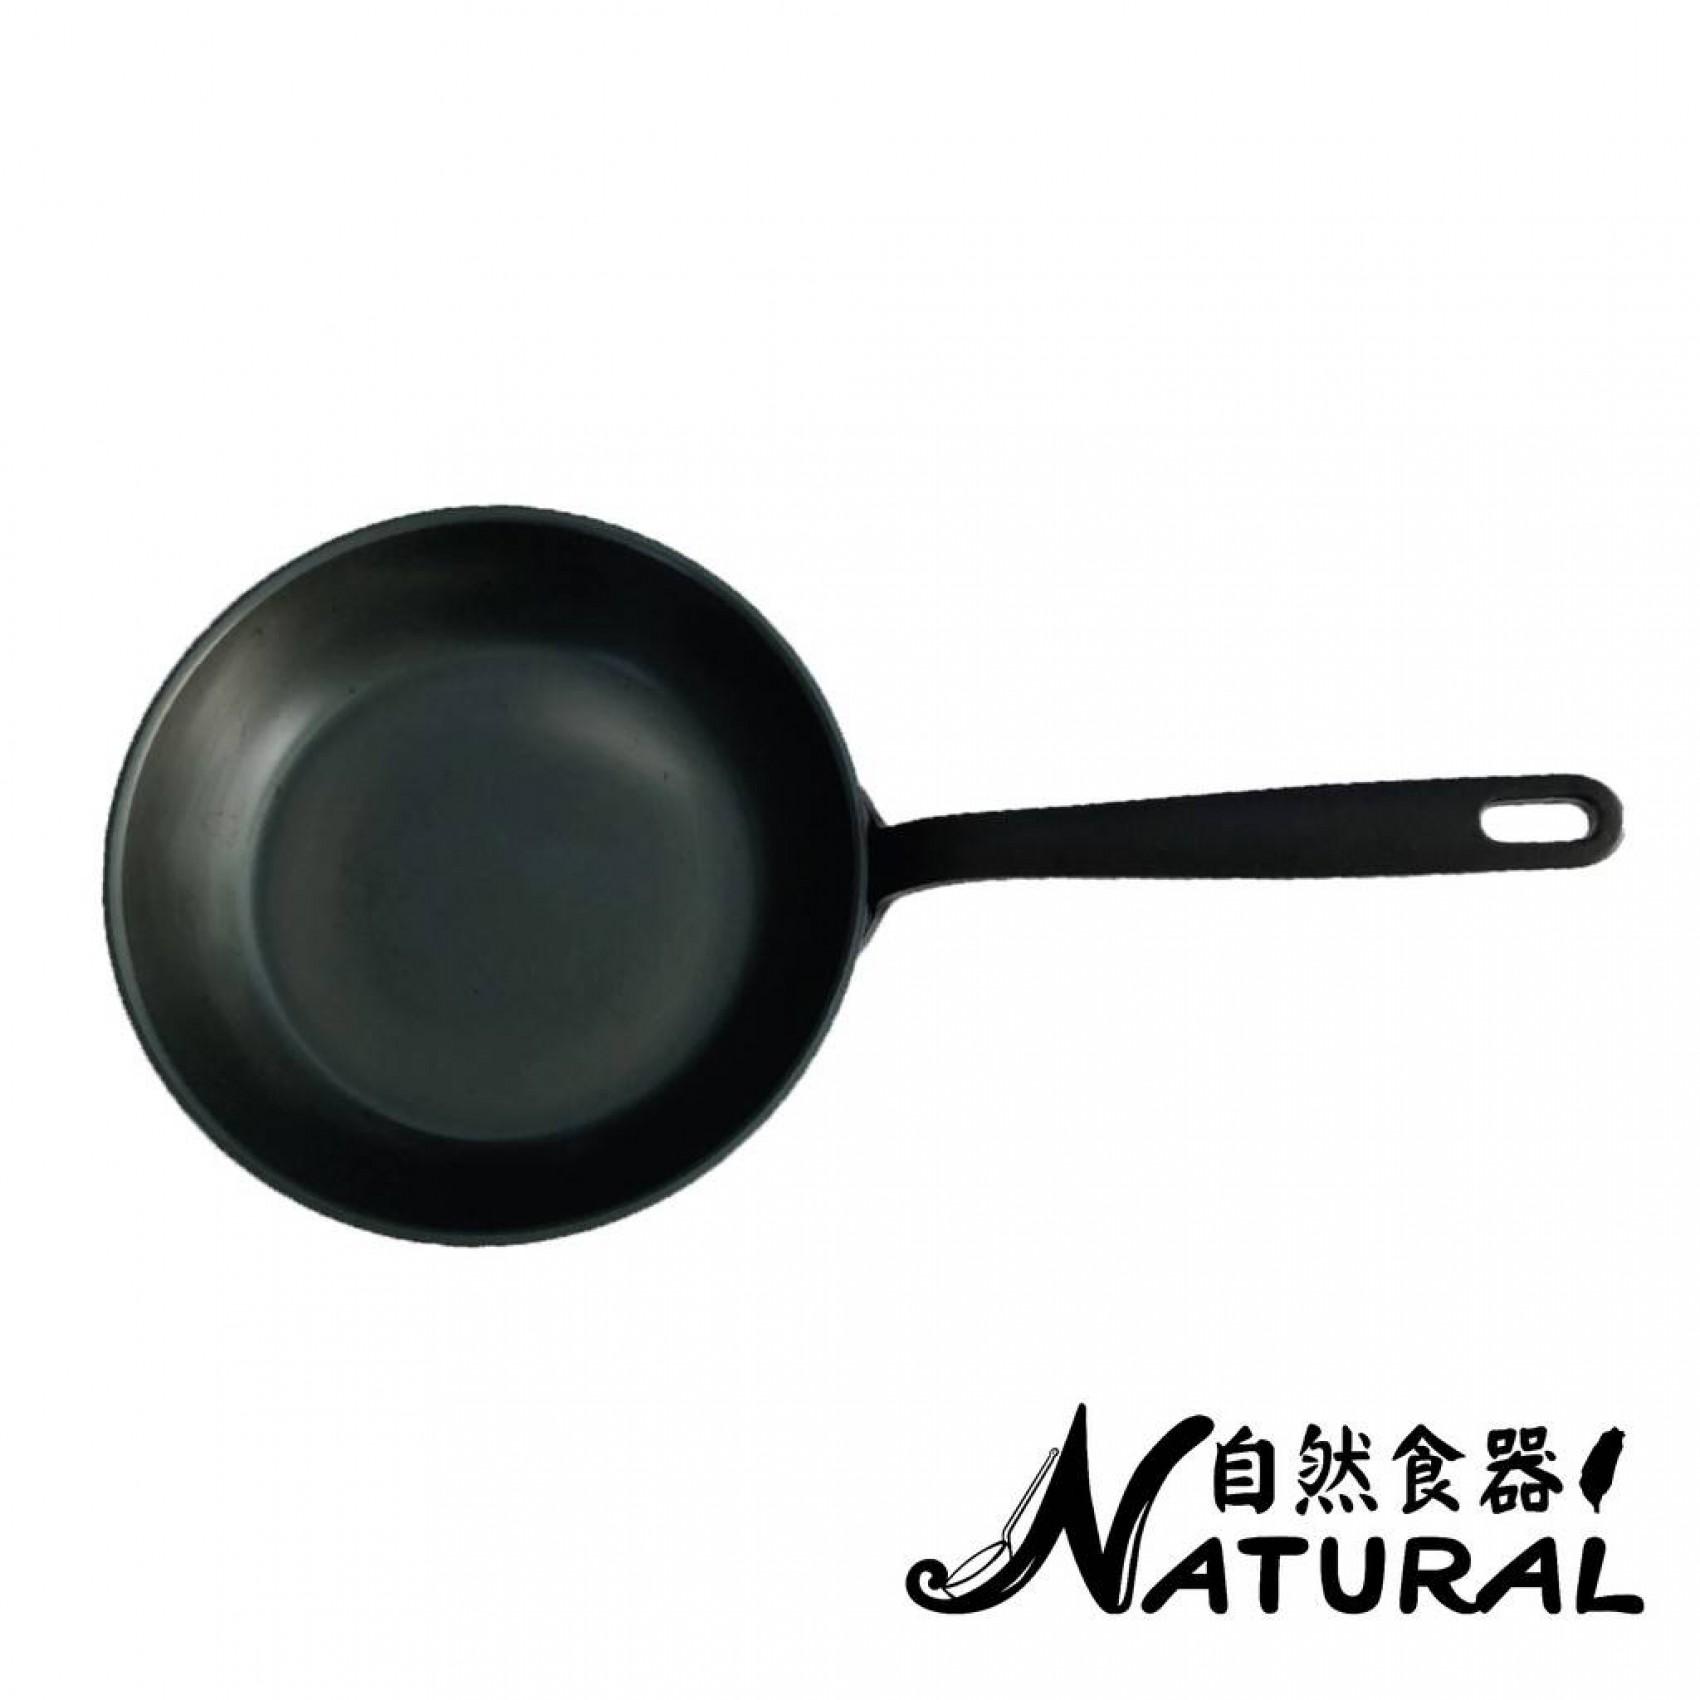 24cm平底鍋 24cm Fry Pan